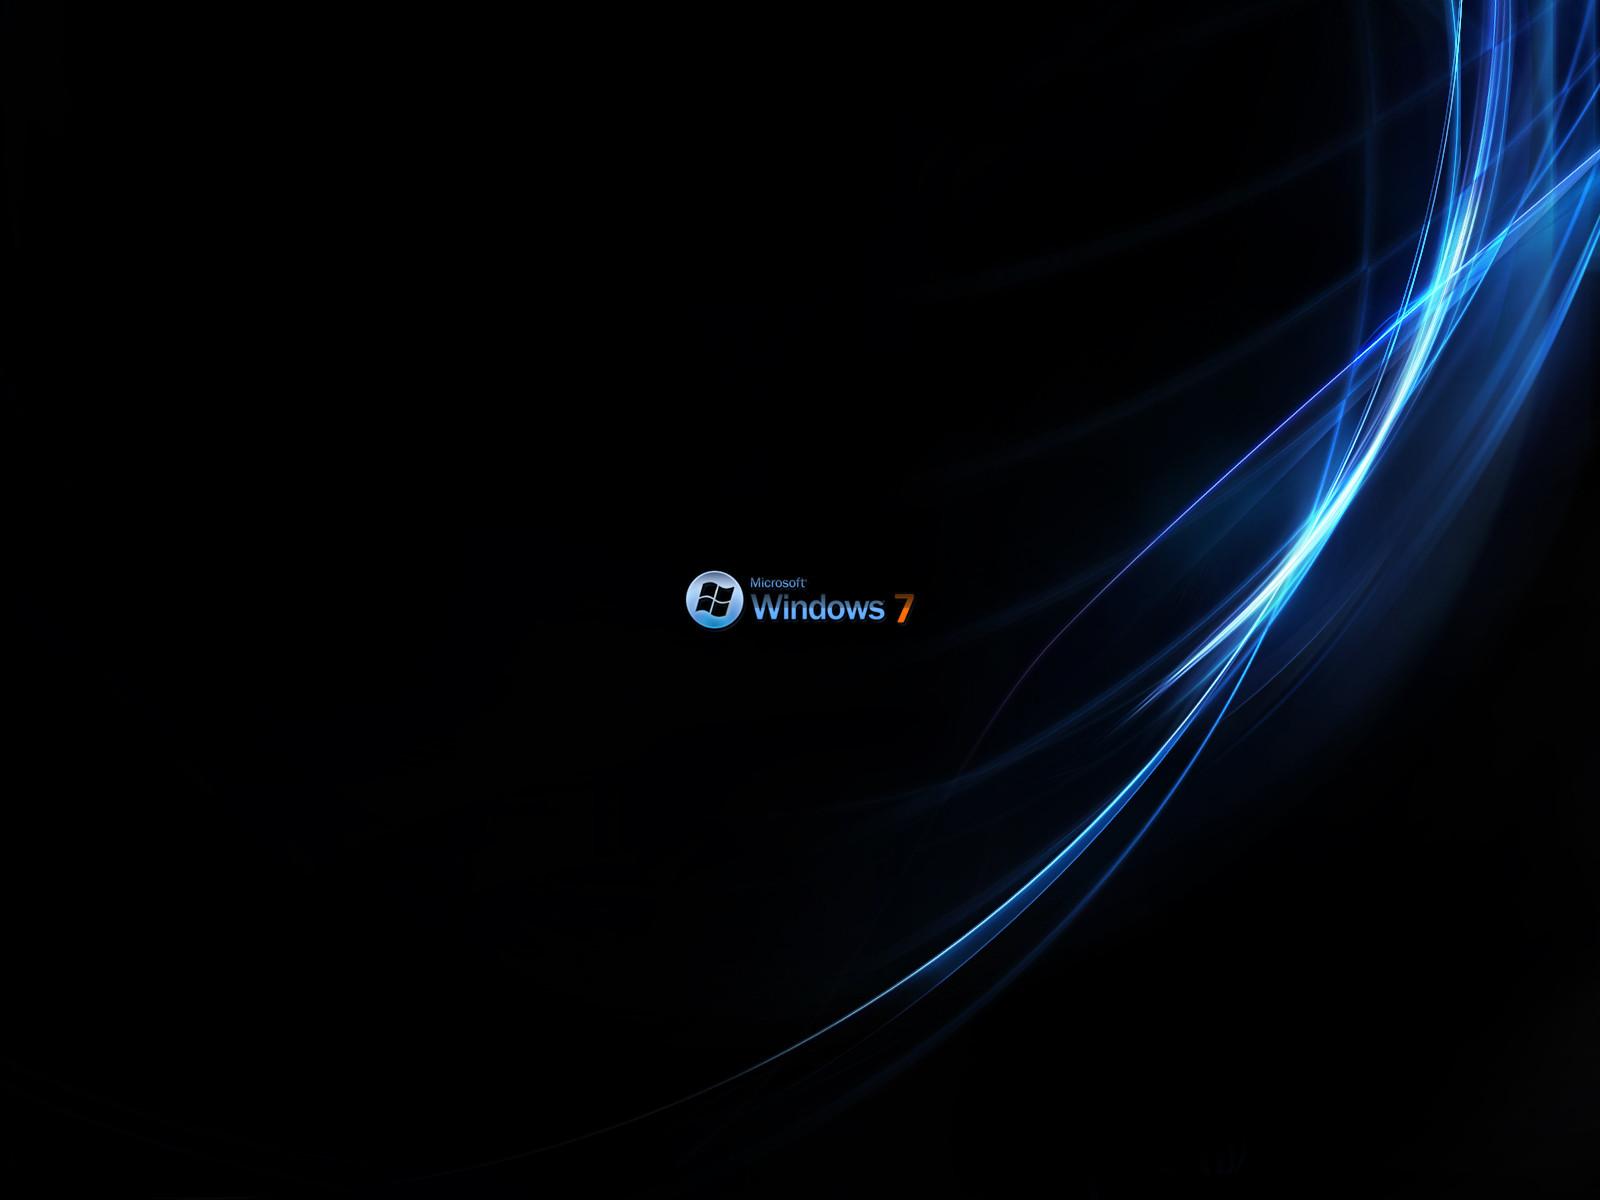 http://4.bp.blogspot.com/_qC04v6cVxsw/TUAFCUCtFFI/AAAAAAAAAEE/emokJTbqd58/s1600/Windows_7.jpg